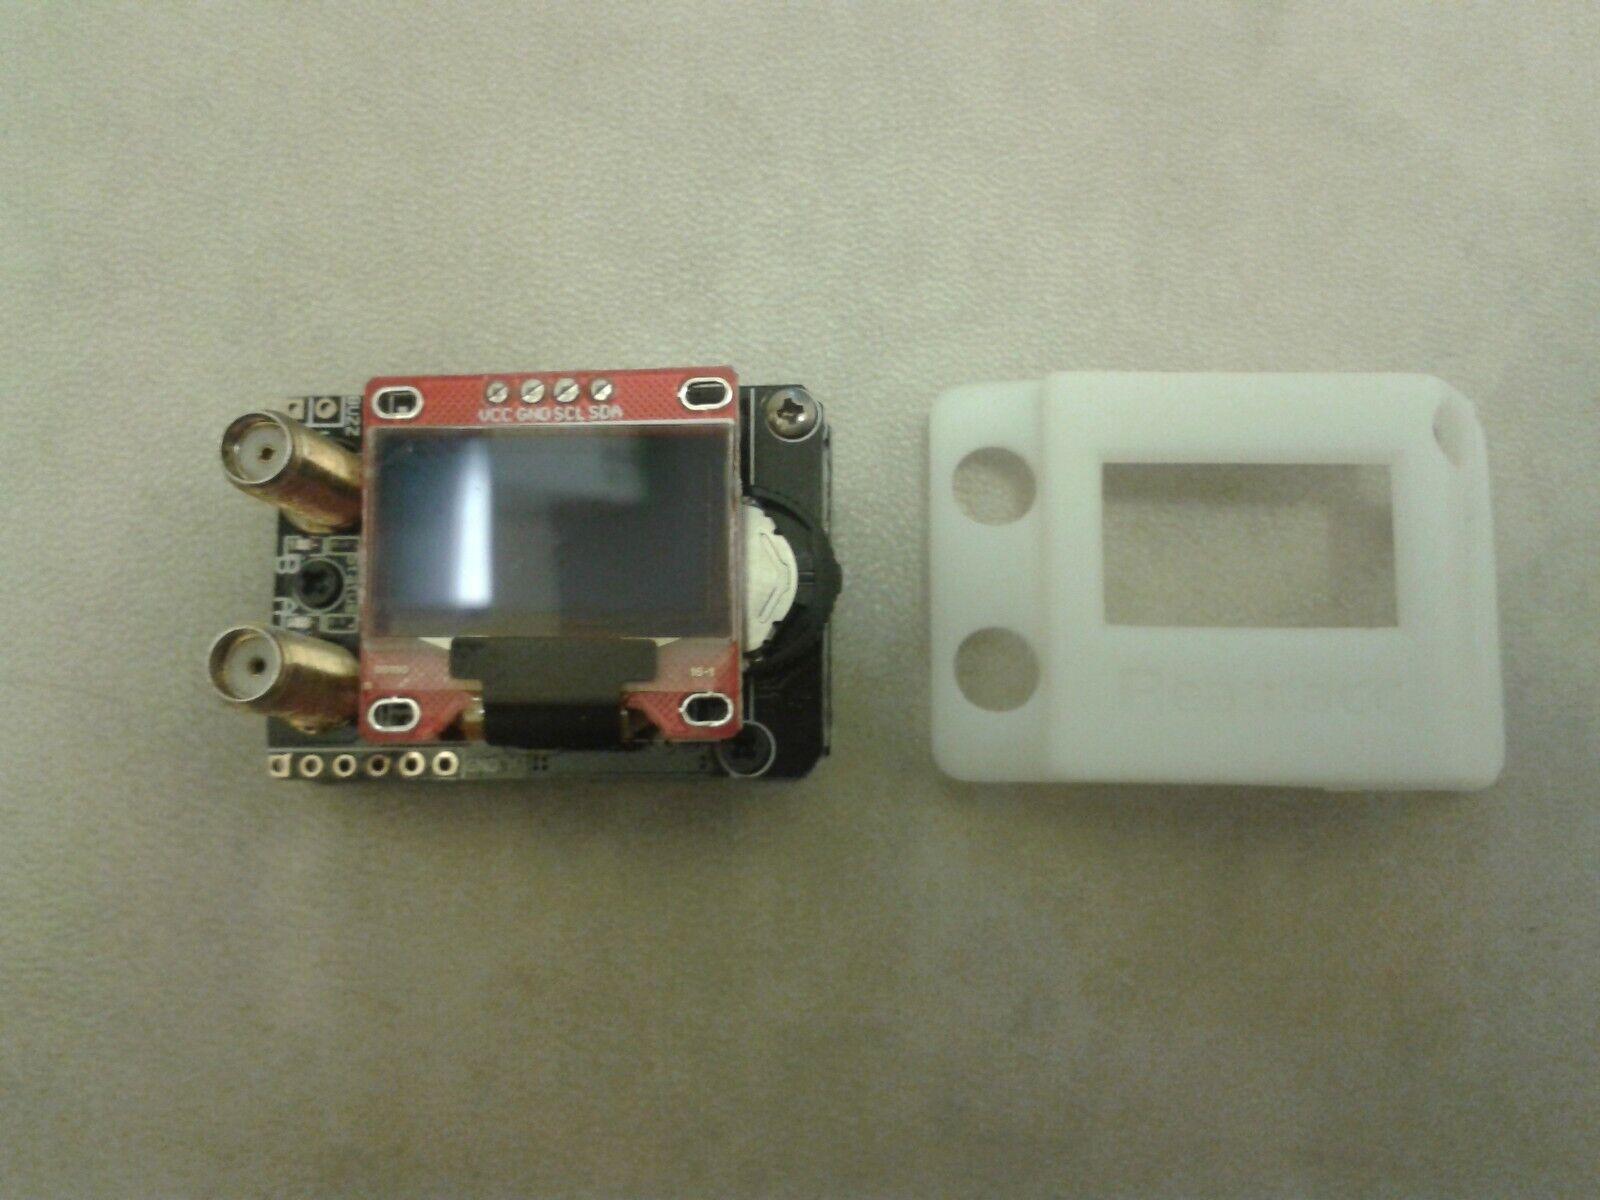 RC FPV 5.8GHz 90dBm 8CH Wireless Audio Video AV Receiving Module For RX5808